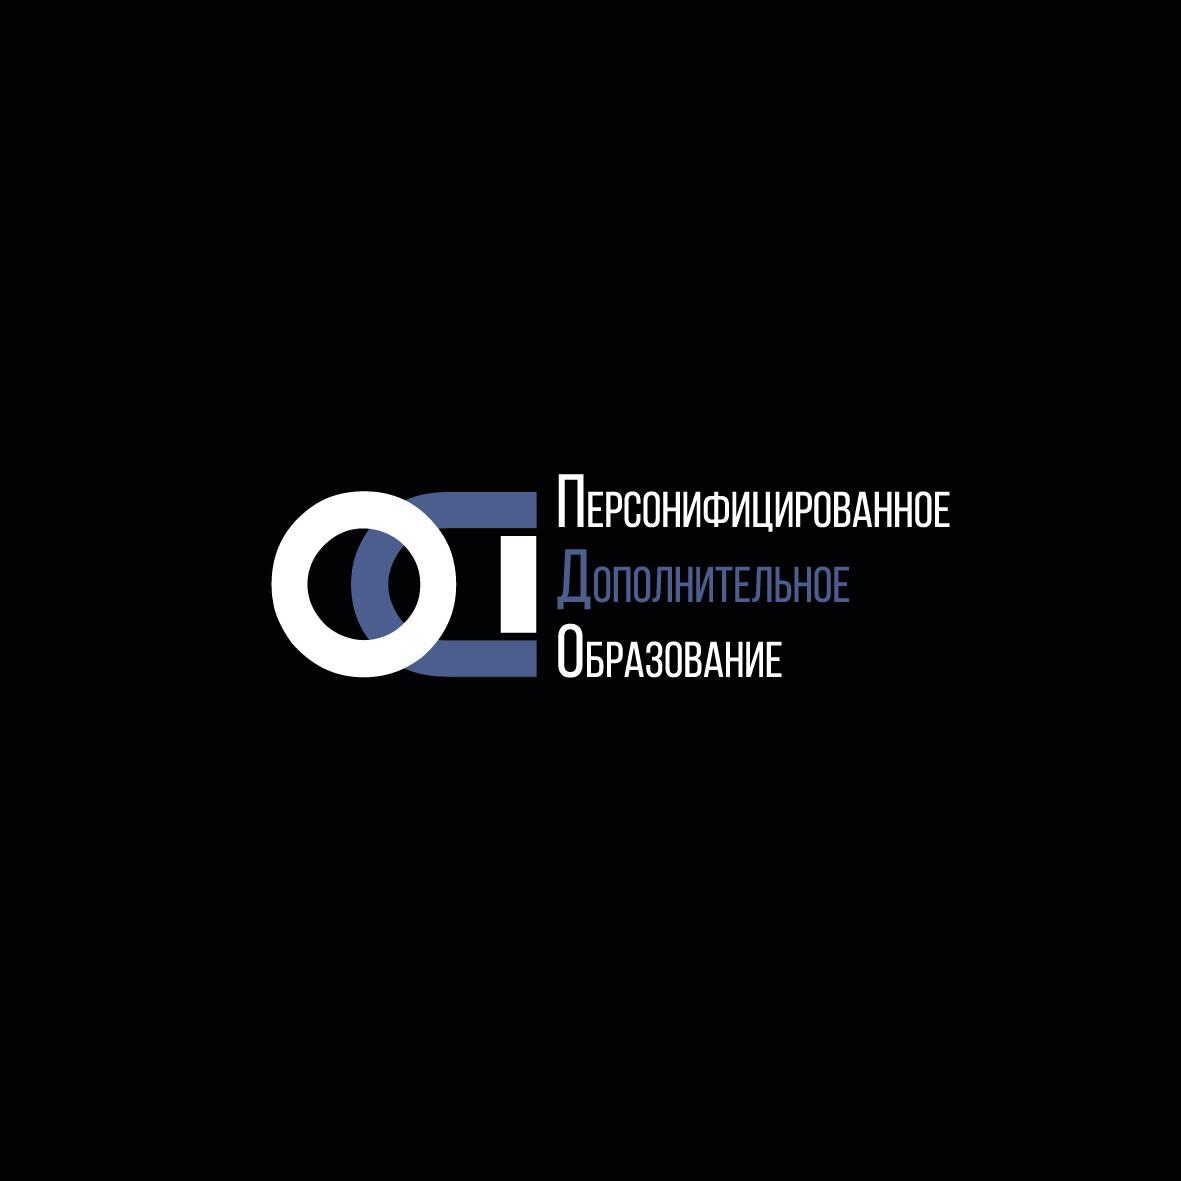 Логотип для интернет-портала фото f_8065a44157545785.jpg